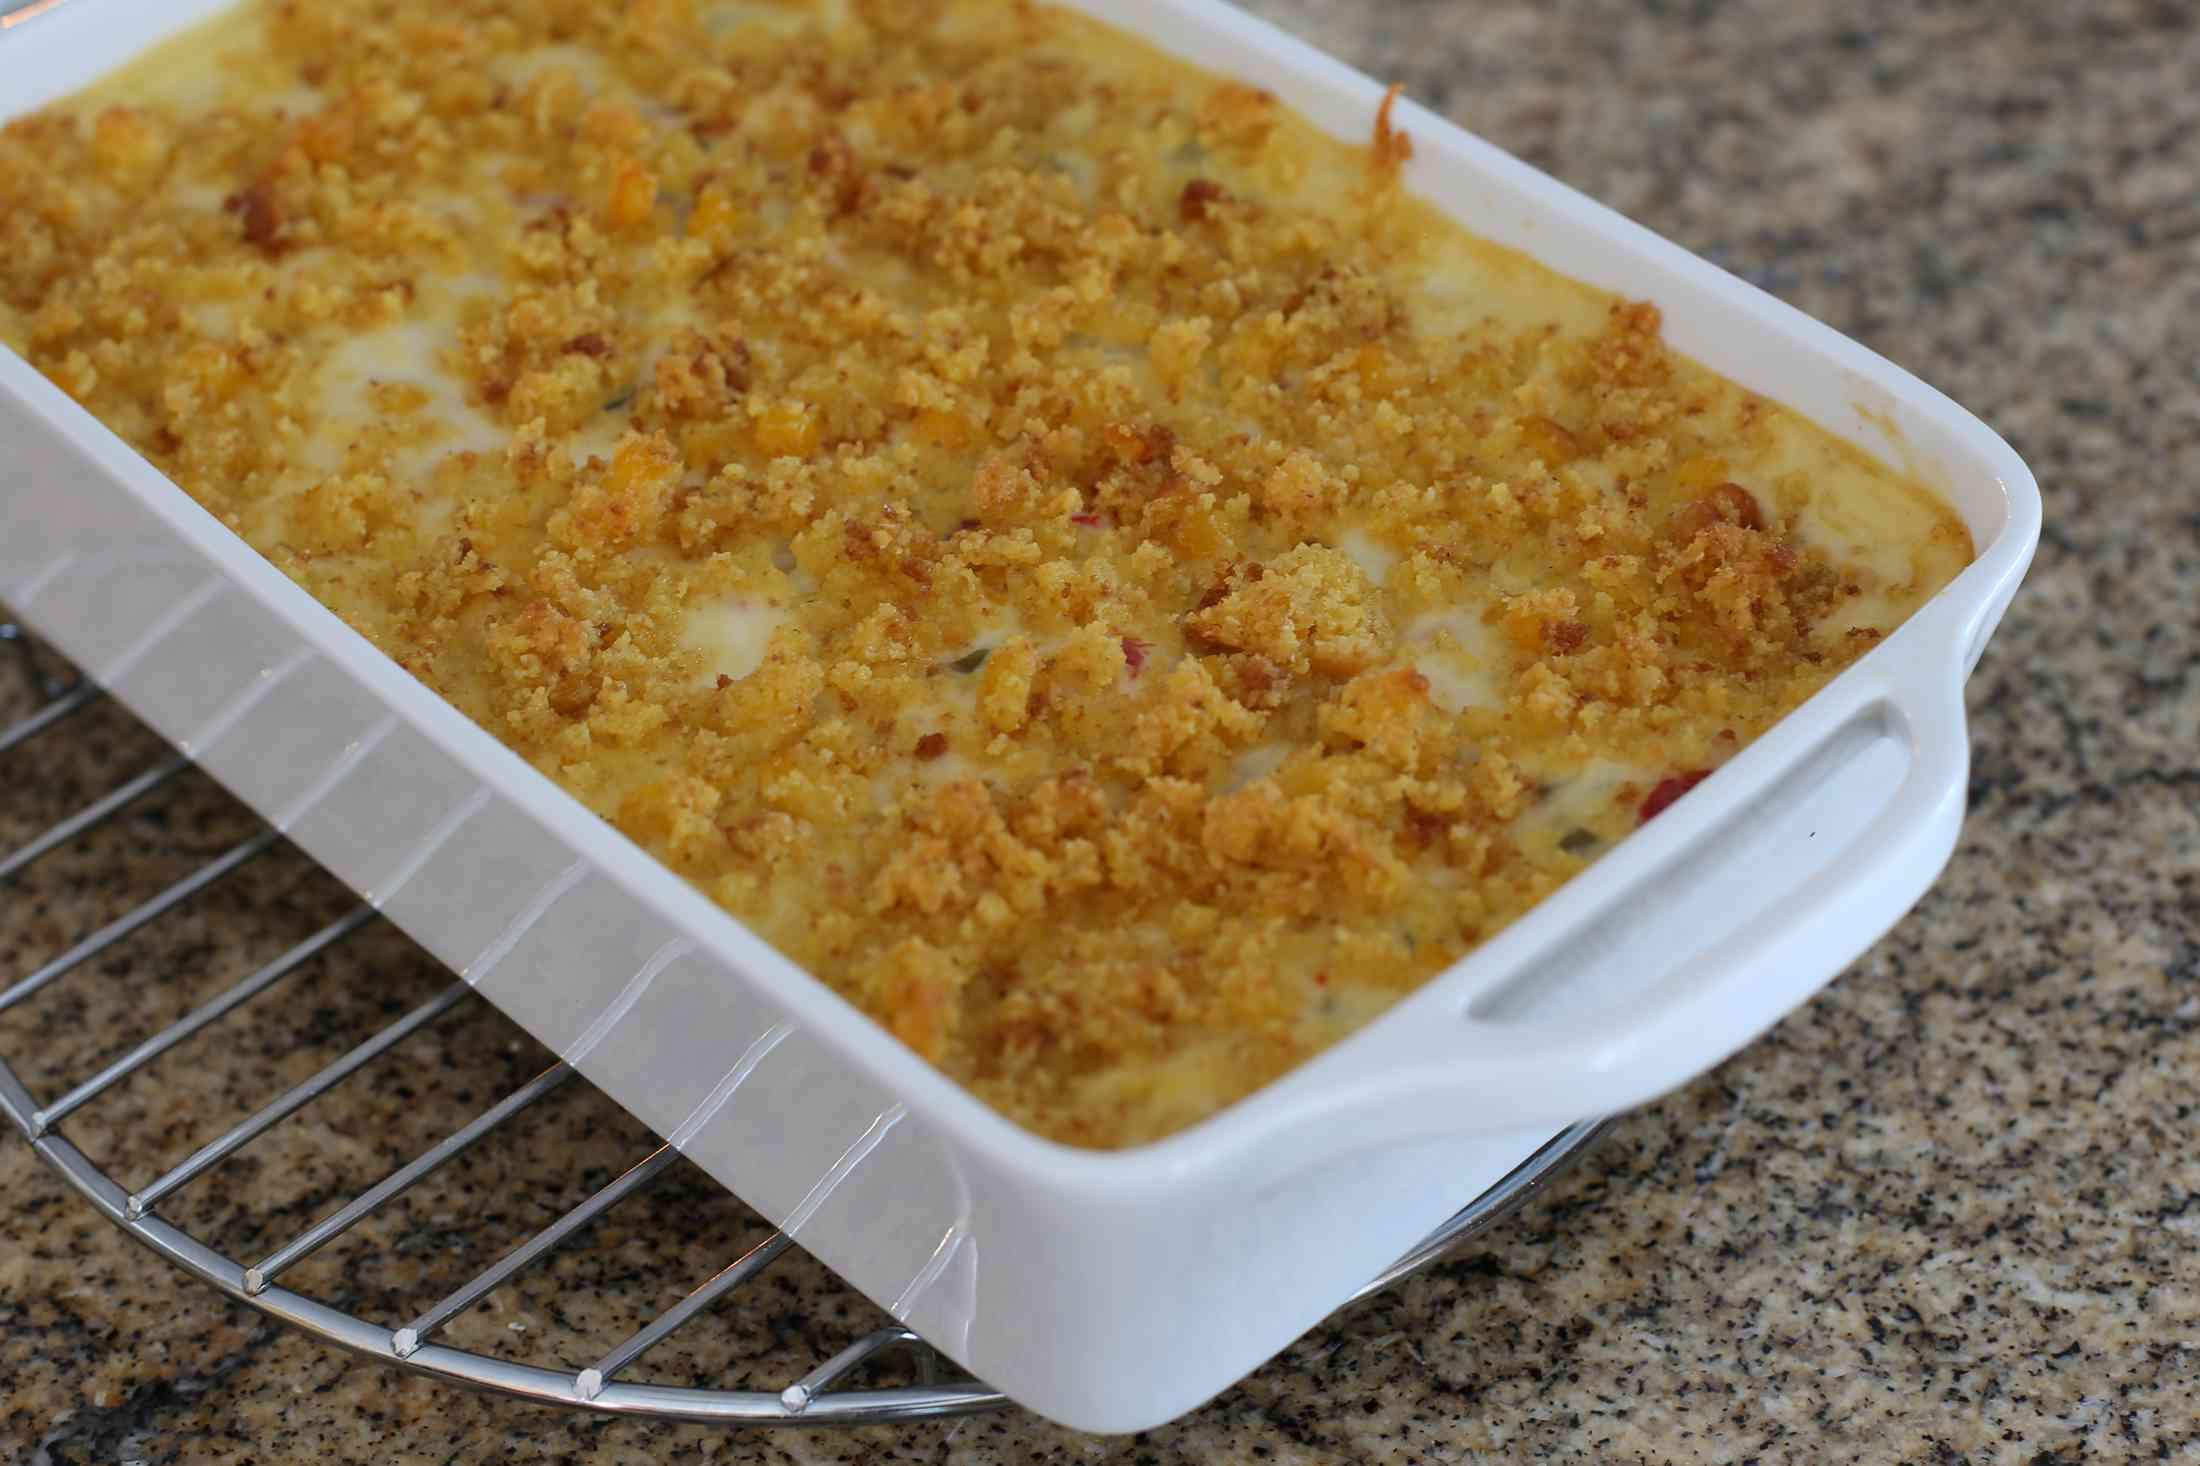 English Pea Casserole With Cornbread Crumb Topping